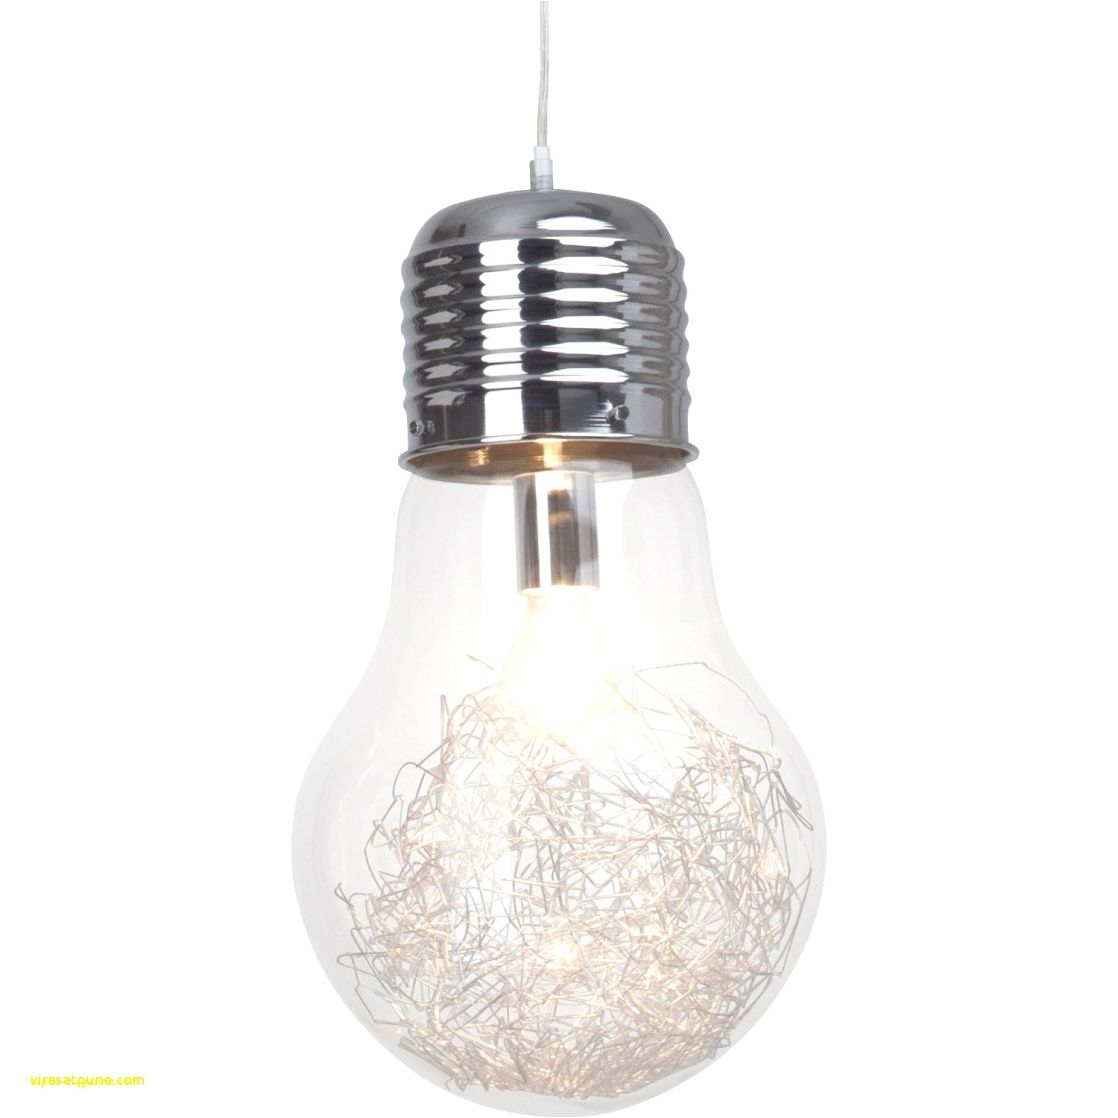 opulent brass light fixtures as though rasultat suparieur grosse suspension luxe grosse suspension 0d